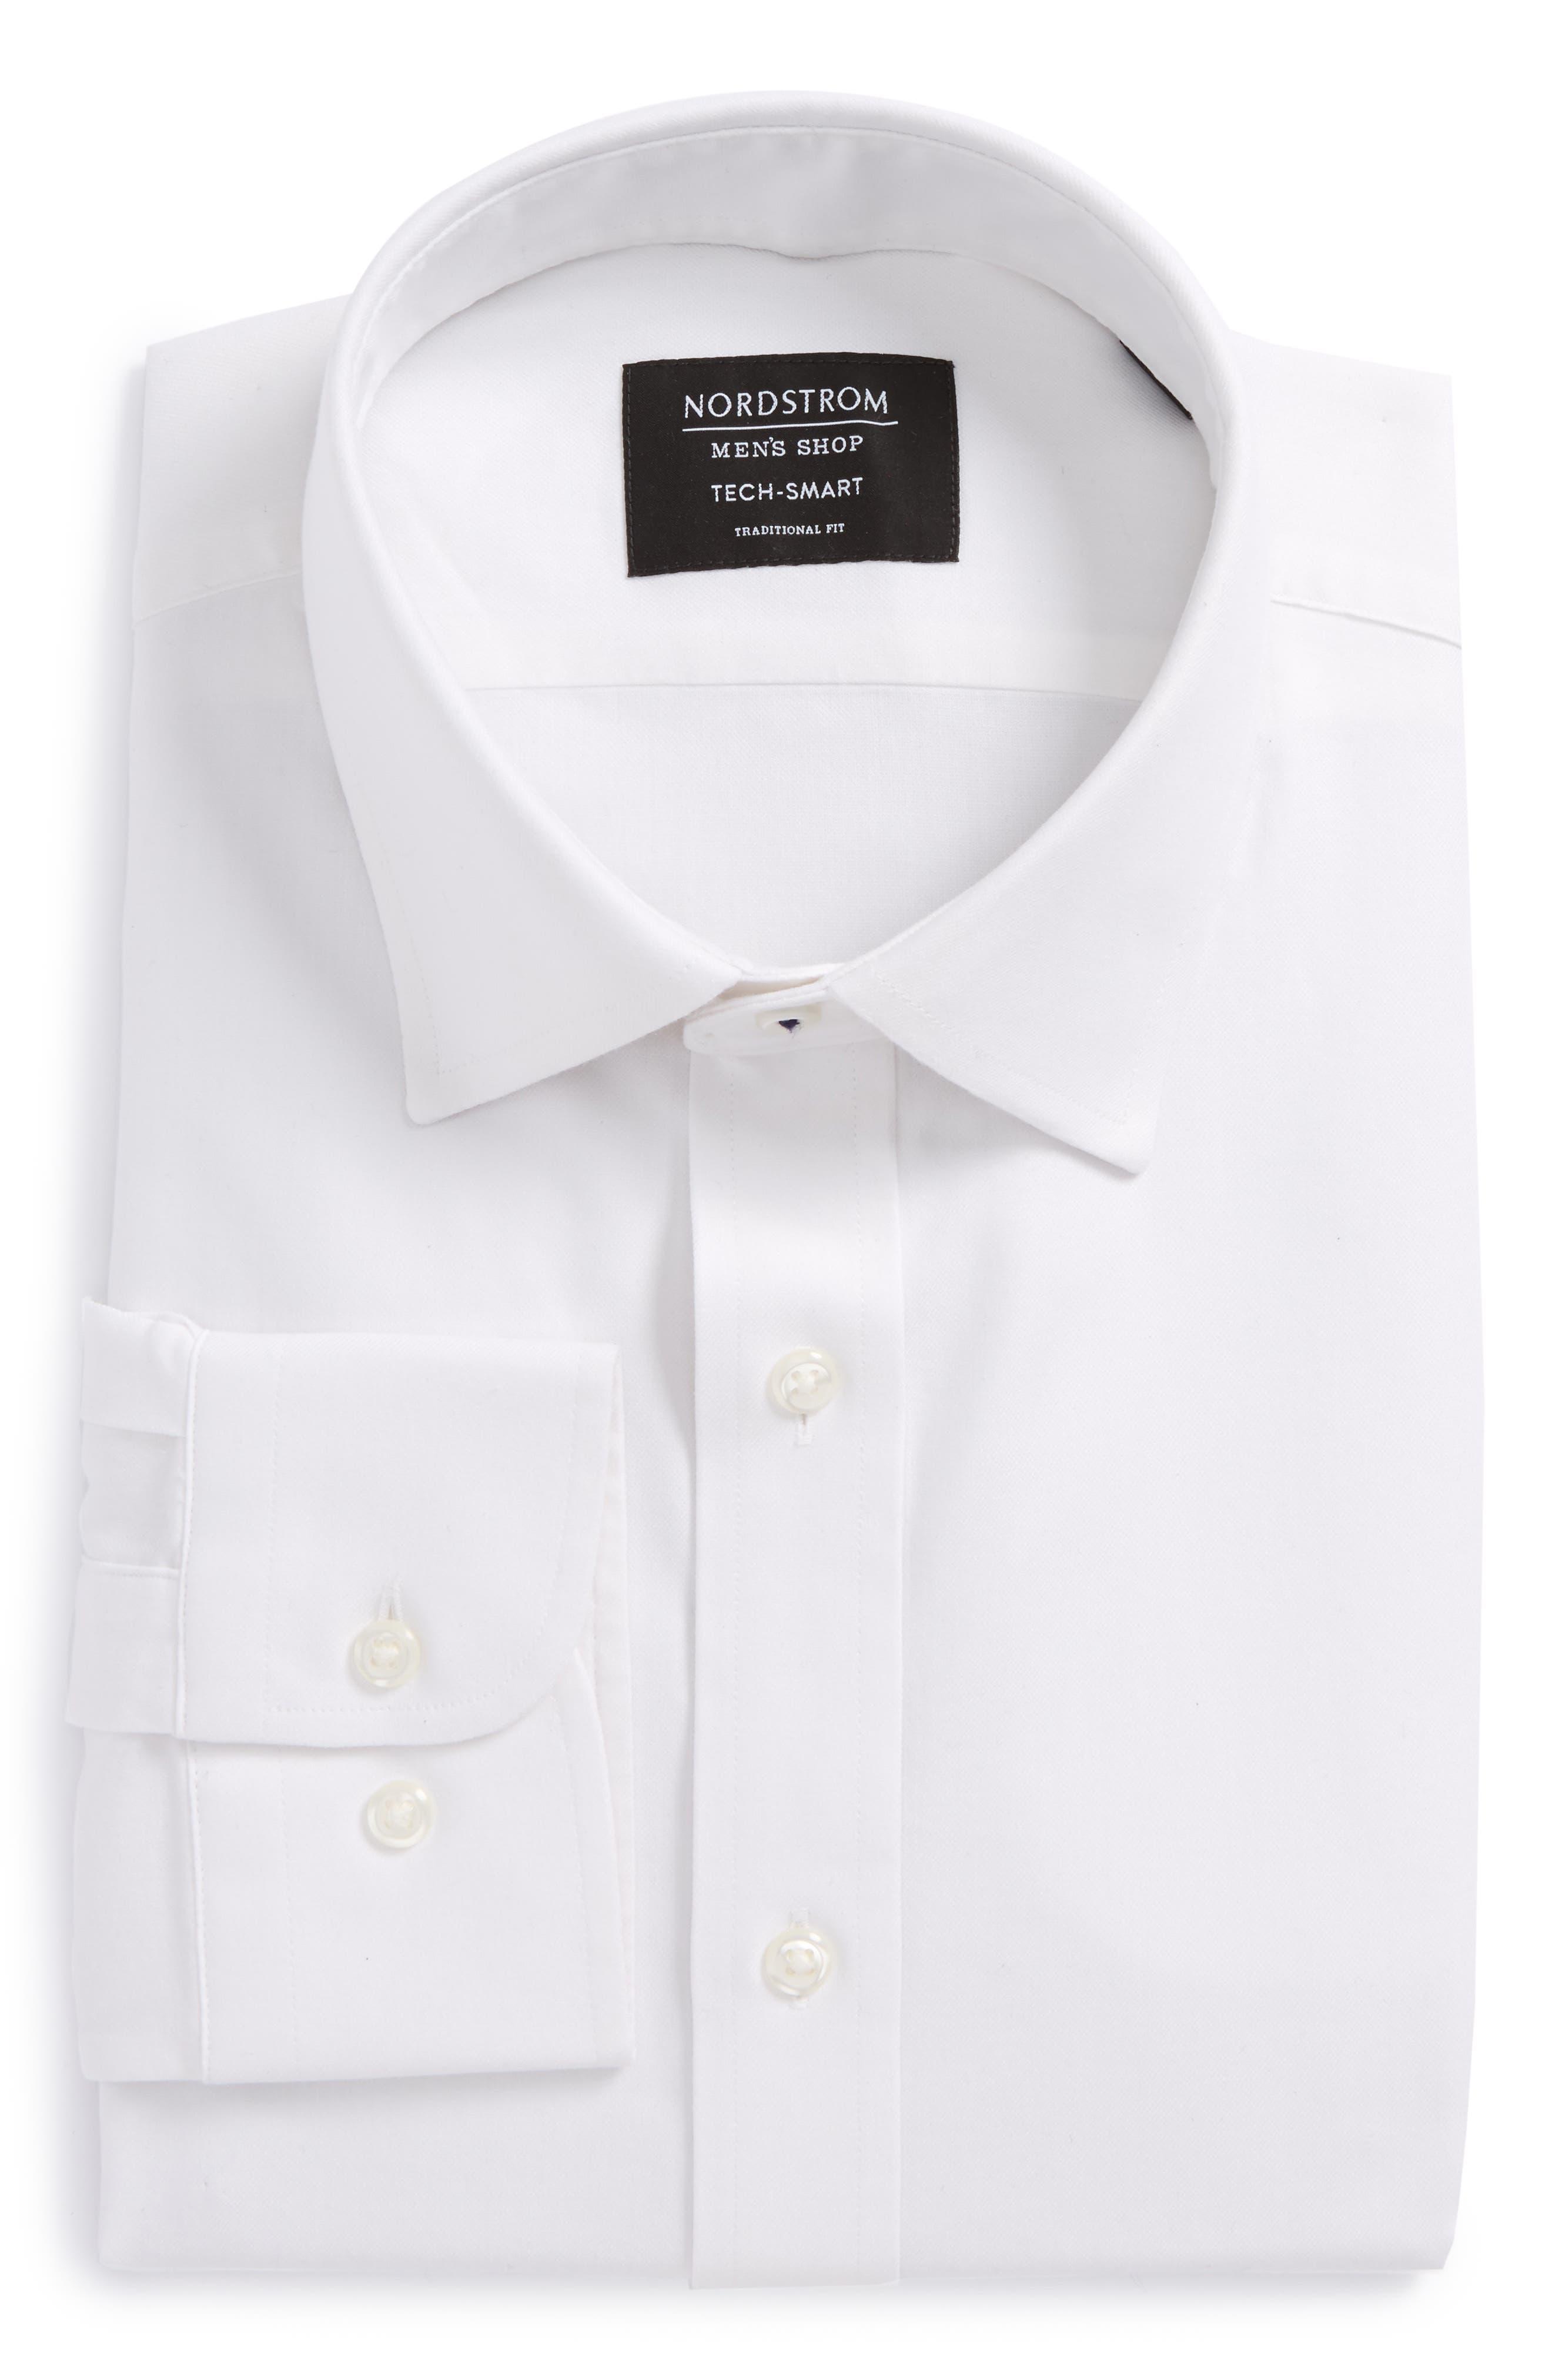 Nordstrom Men's Shop Tech-Smart Traditional Fit Solid Dress Shirt